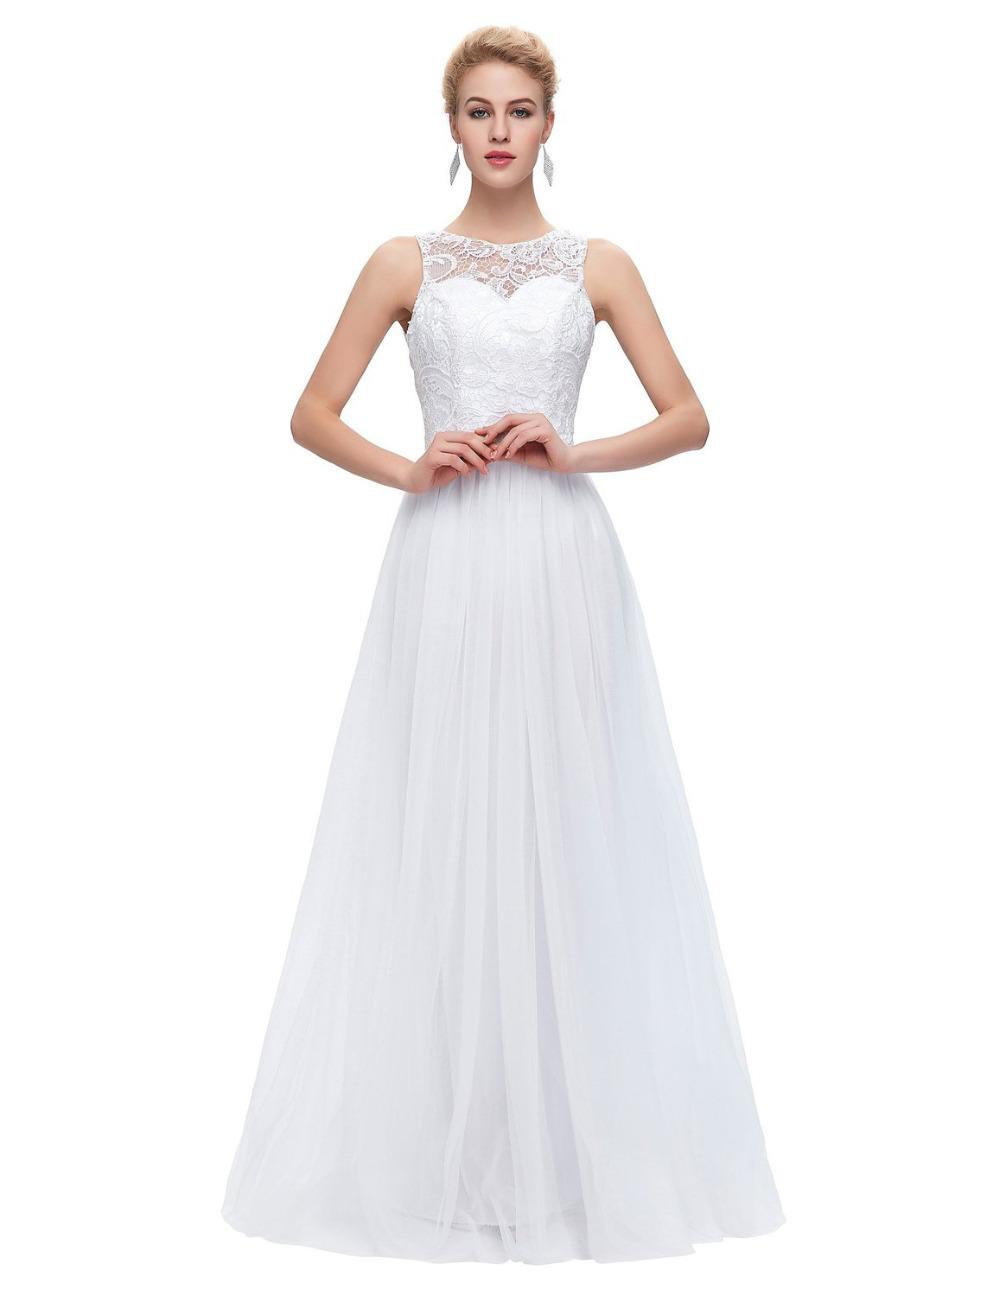 Robe de mariage plus la taille royaume uni promotion for Plus la taille seconde robes de mariage